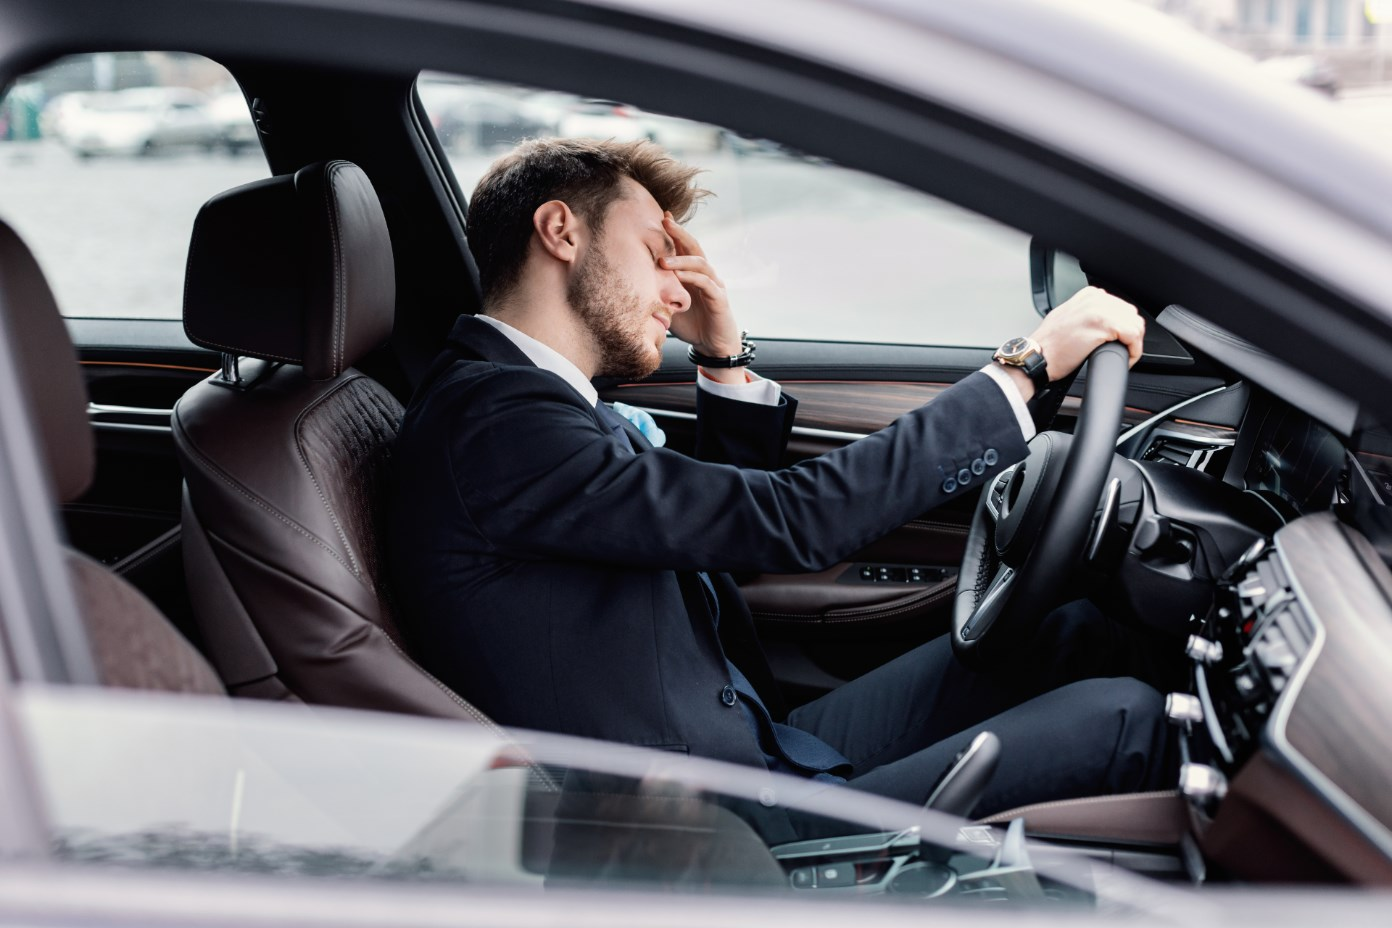 gaming-tips-short-driving-times.jpg